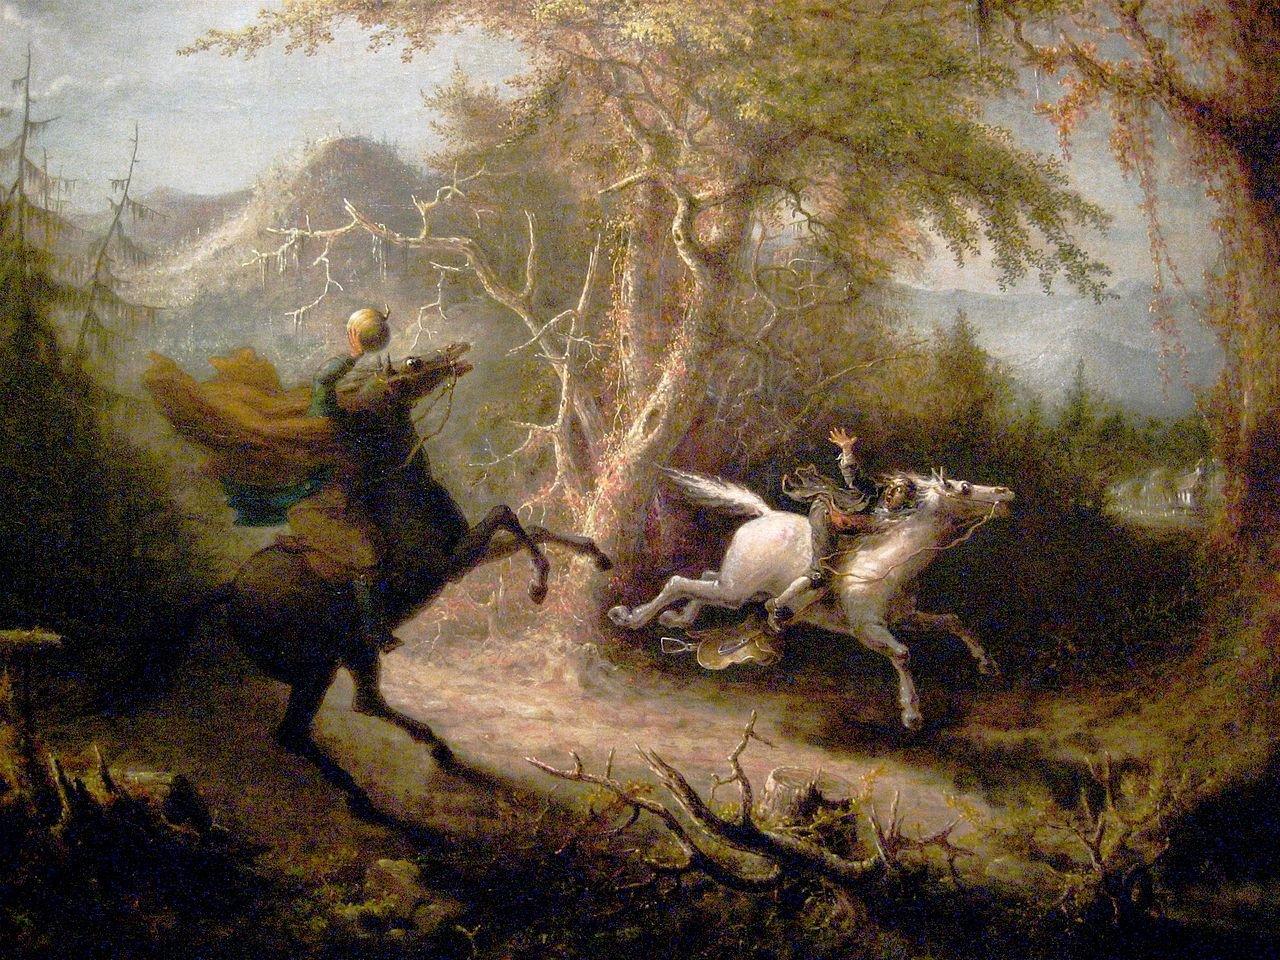 The Headless Horseman Pursuing Ichabod Crane by John Quidor, 1858